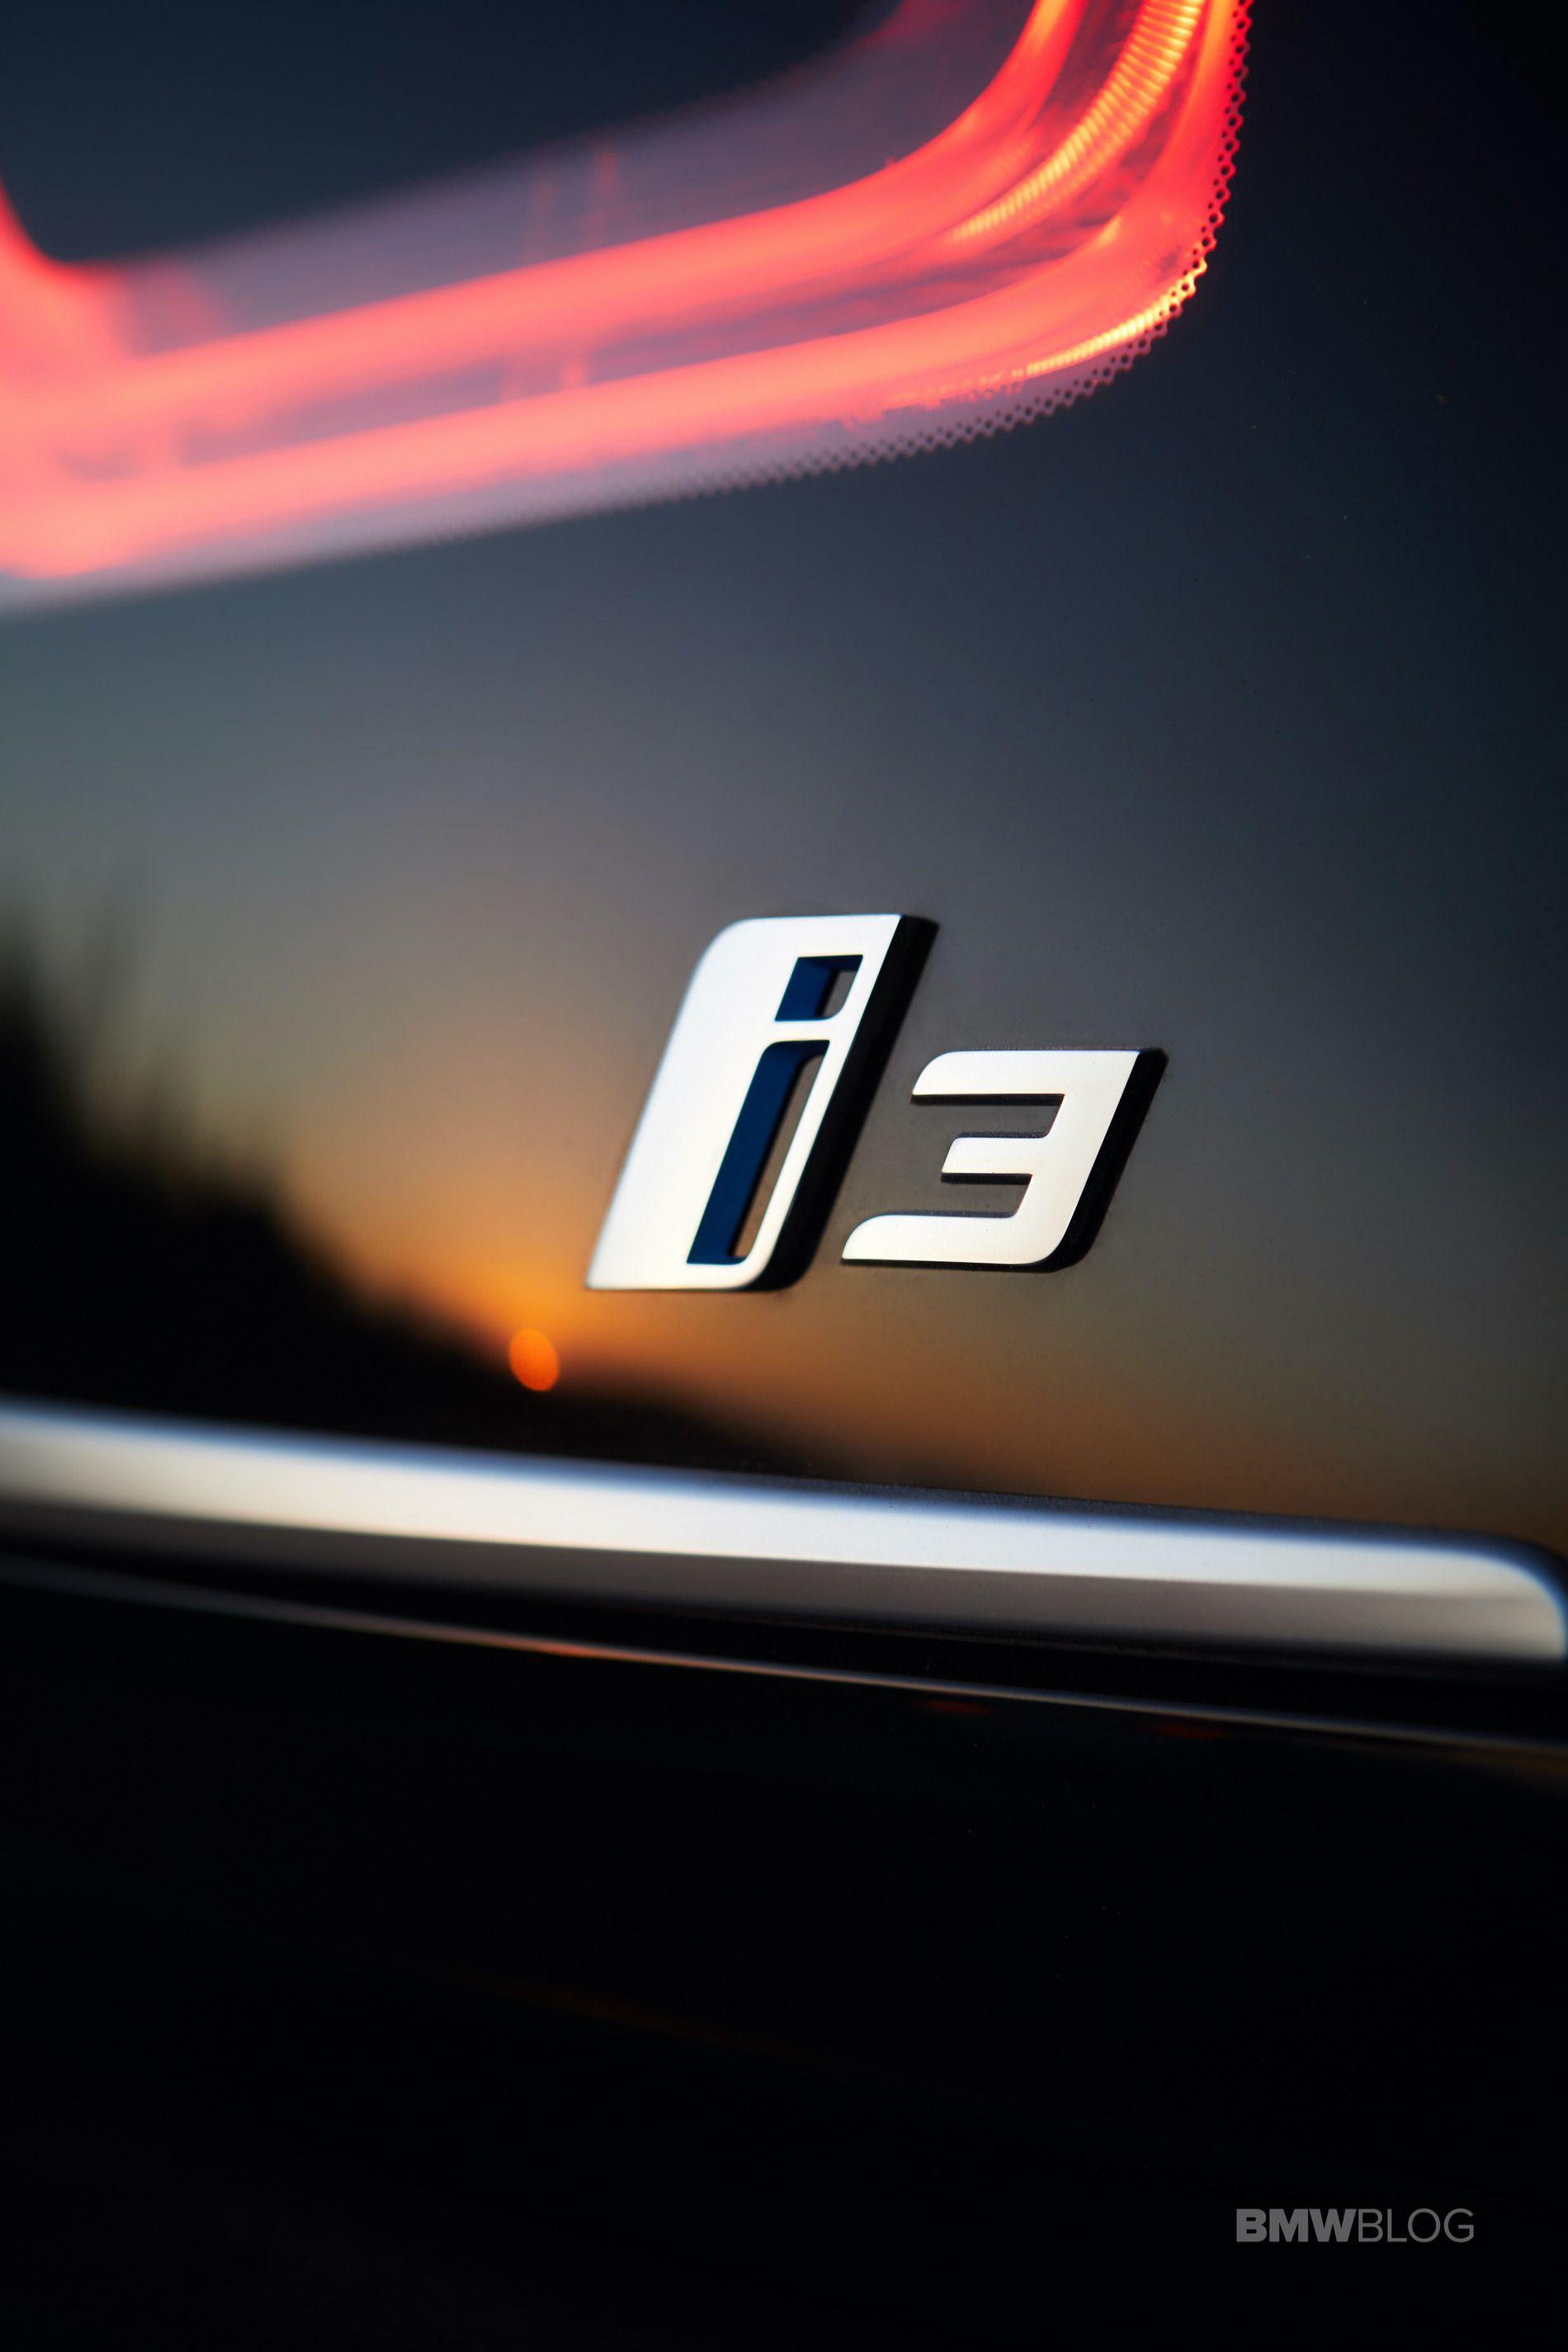 BMW i3 Jucaro Beige Metallic 16